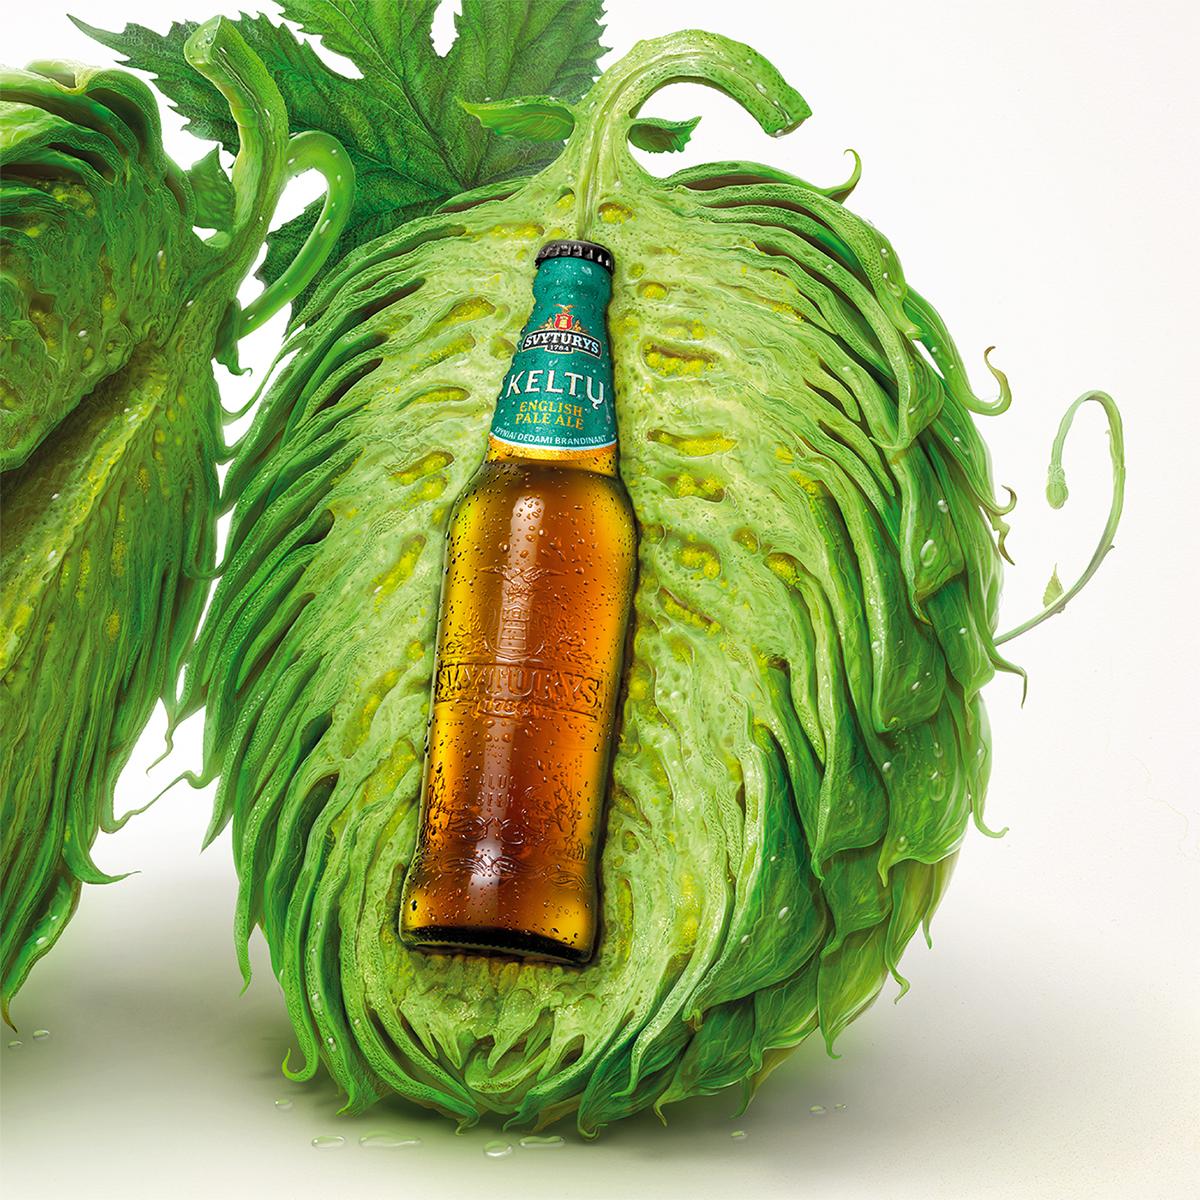 Svyturys beer hop macro vilnius lithuania Celtic 3D